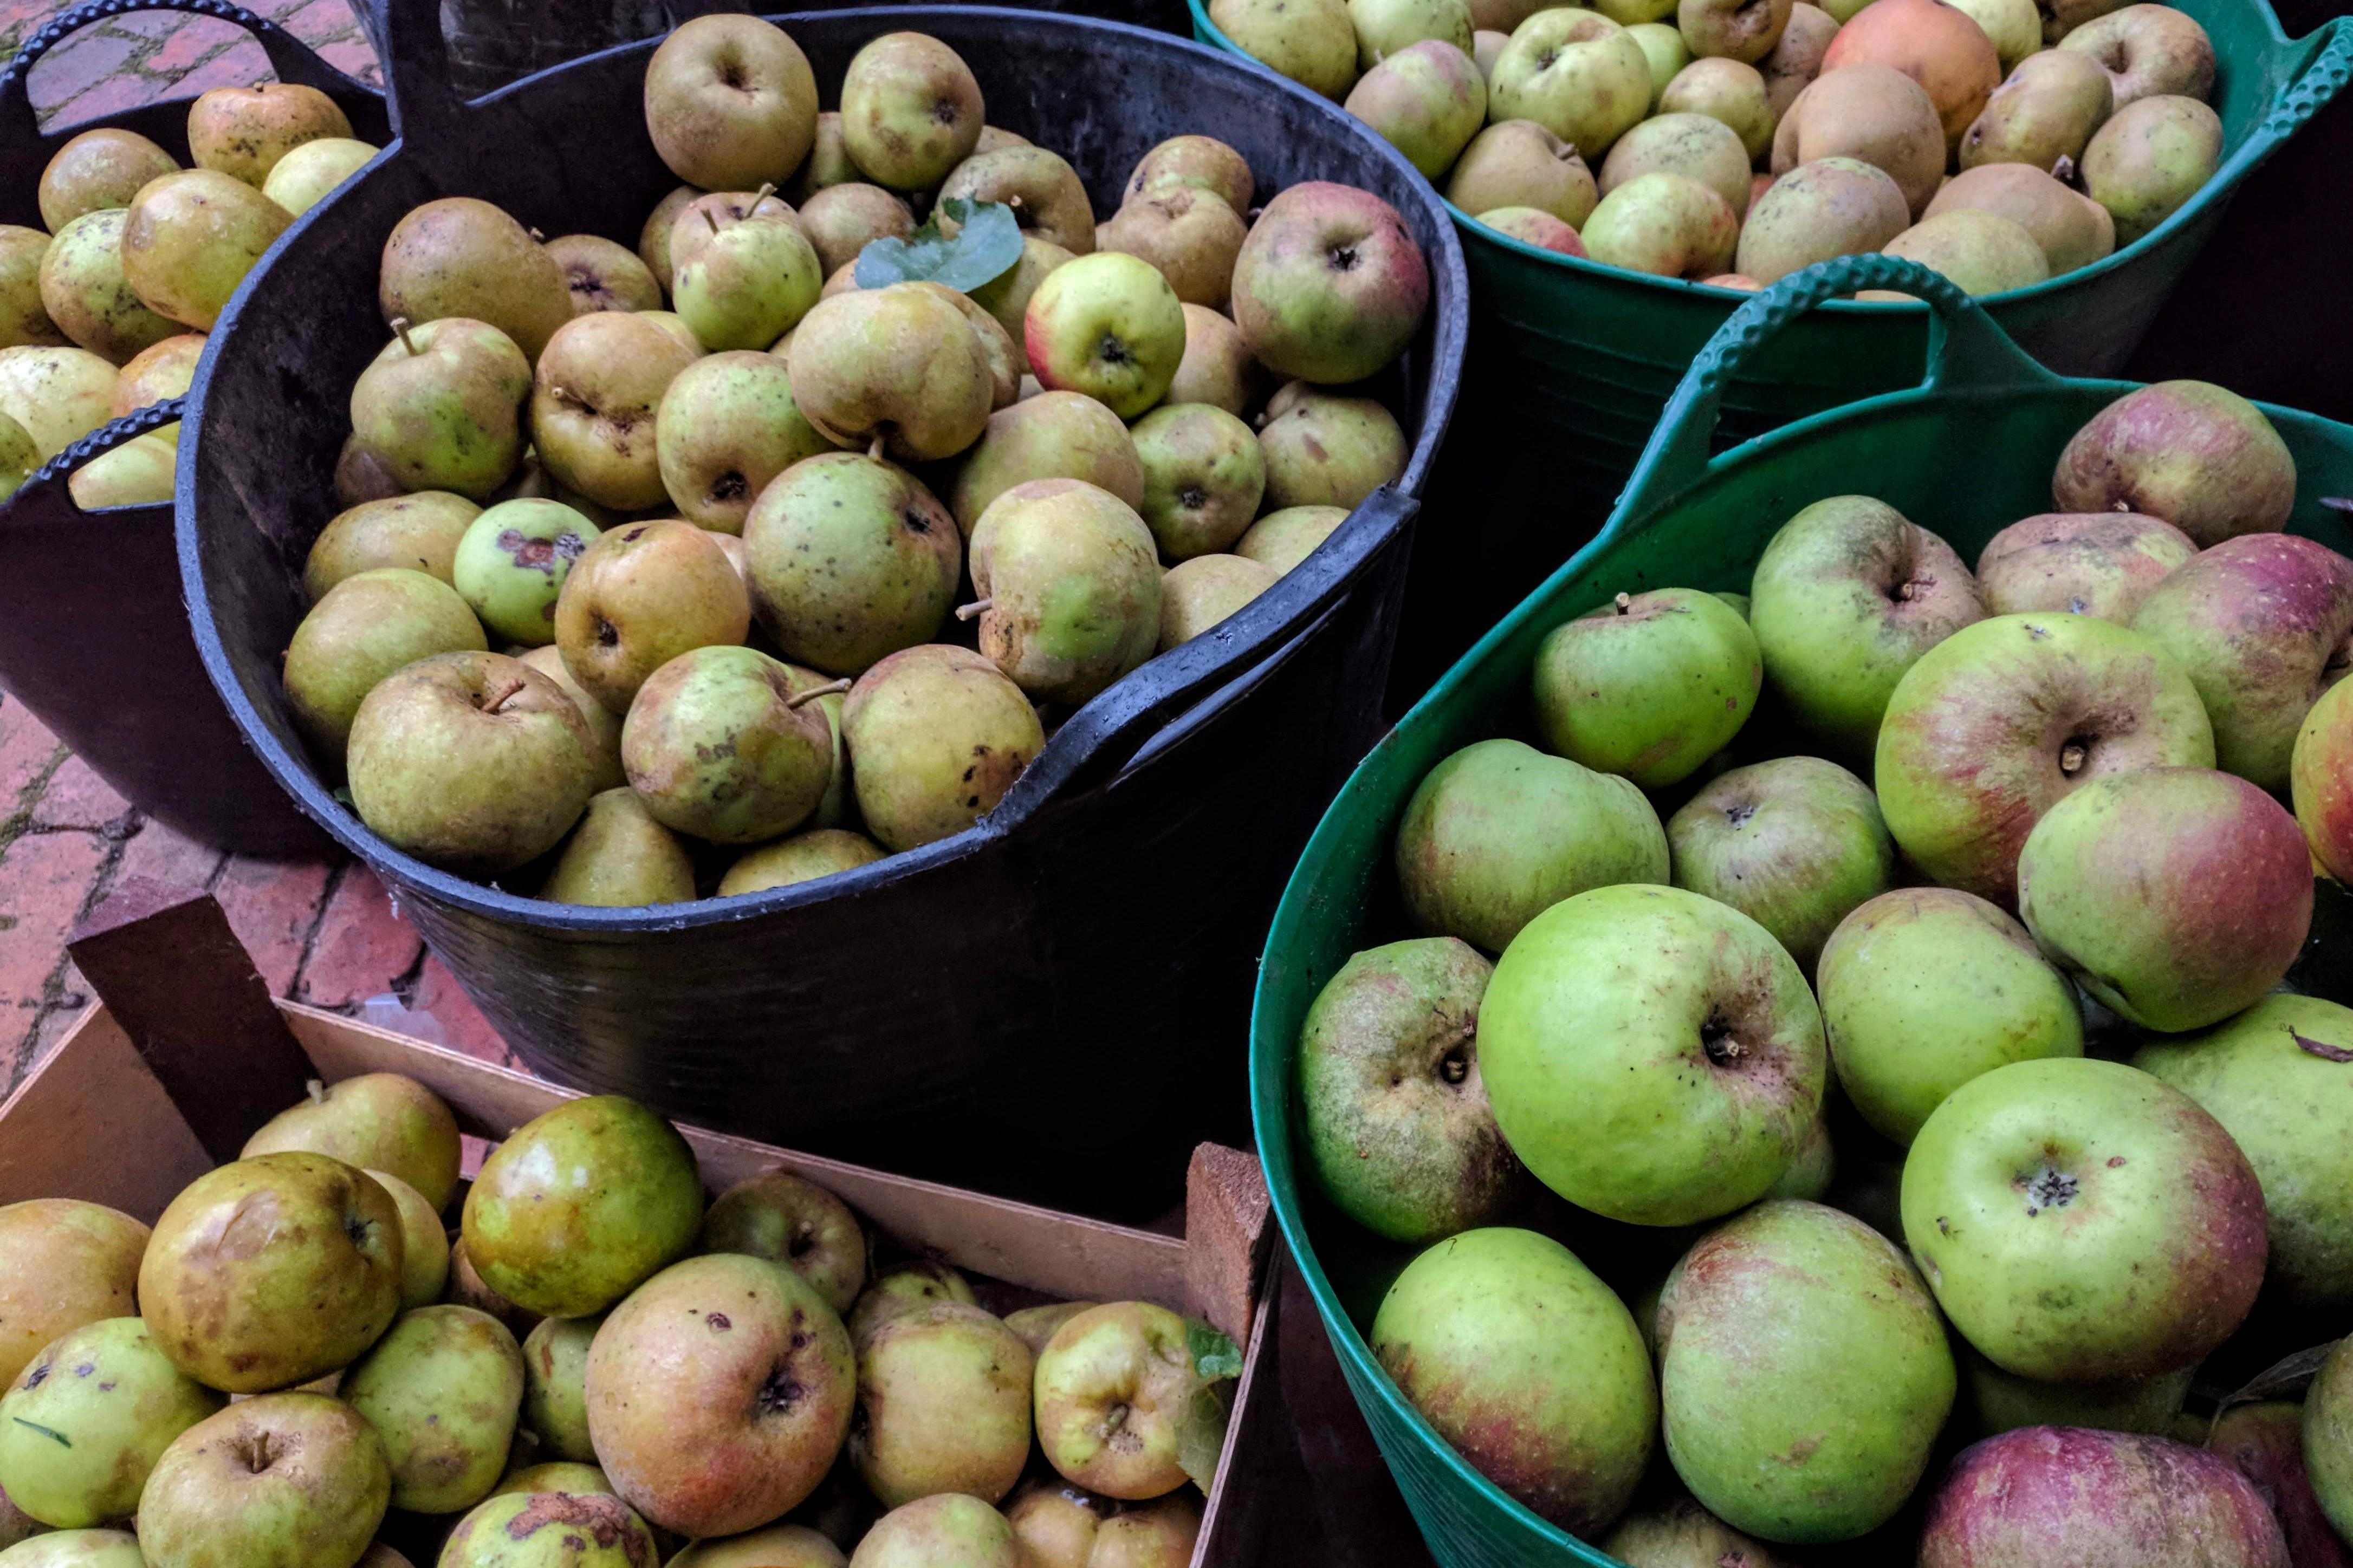 Appels van de Ekelaars